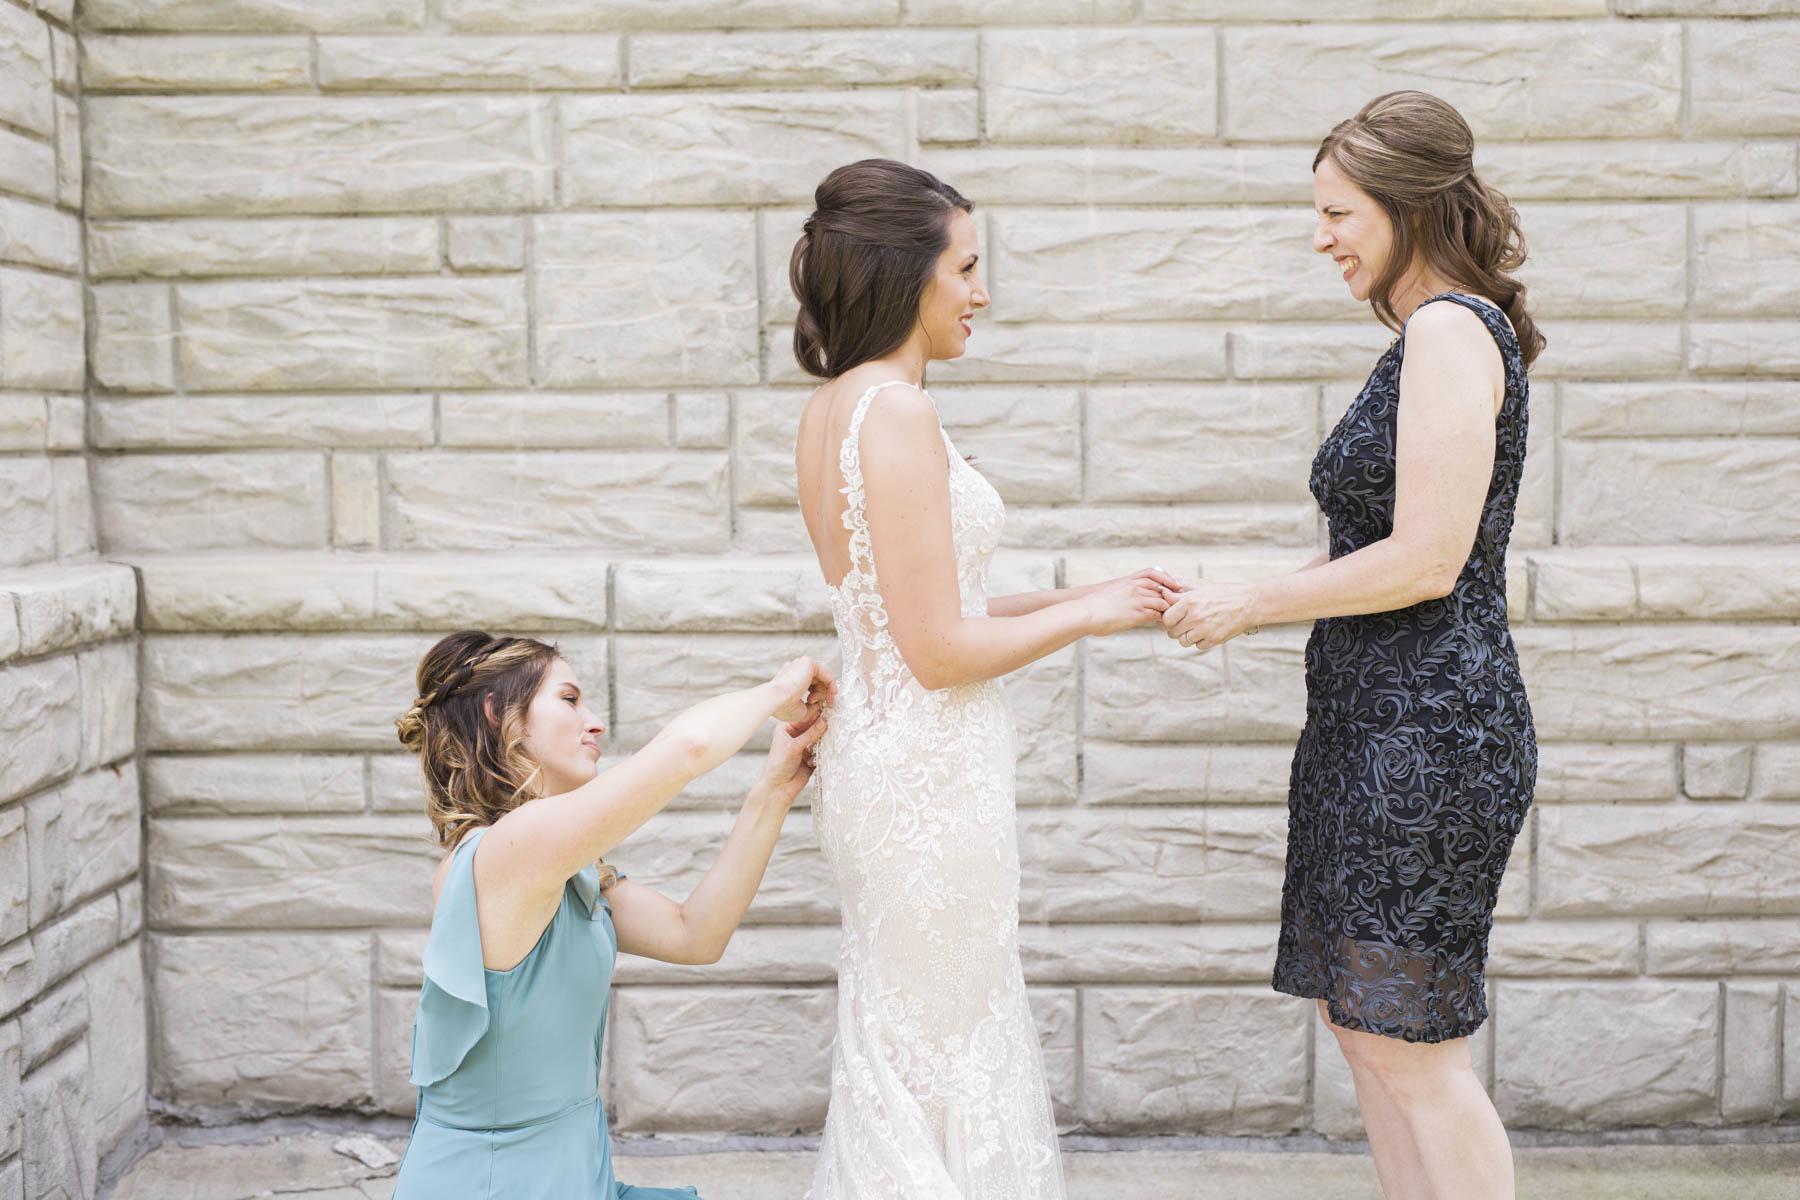 shotbychelsea_wedding_blog-8.jpg